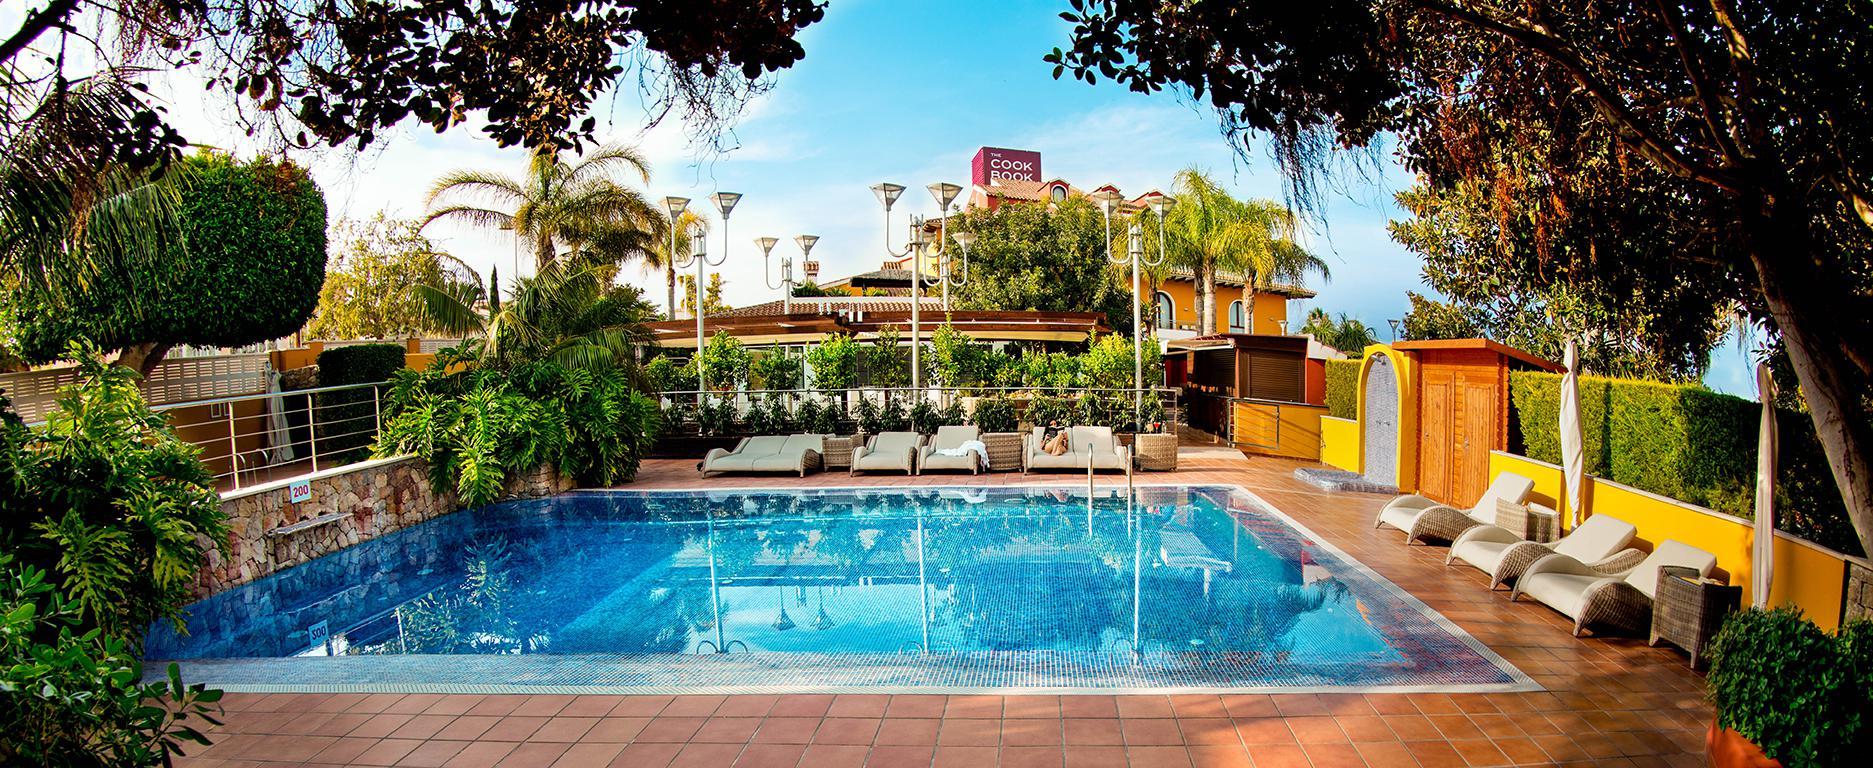 Hotel The Cookbook Gastro Boutique & Spa - inclusief huurauto aanbieding Sunweb